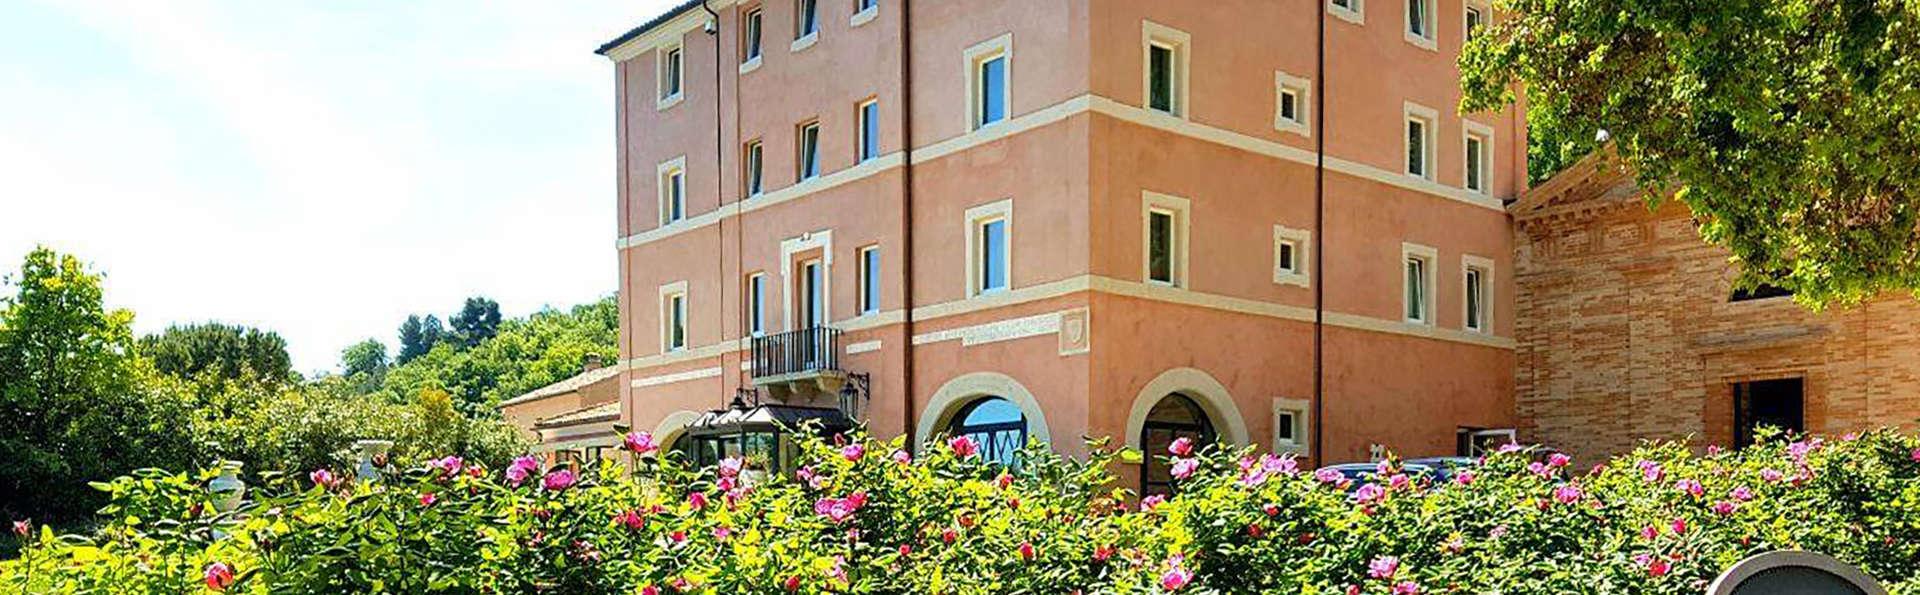 Villa Lattanzi - Edit_Front2.jpg